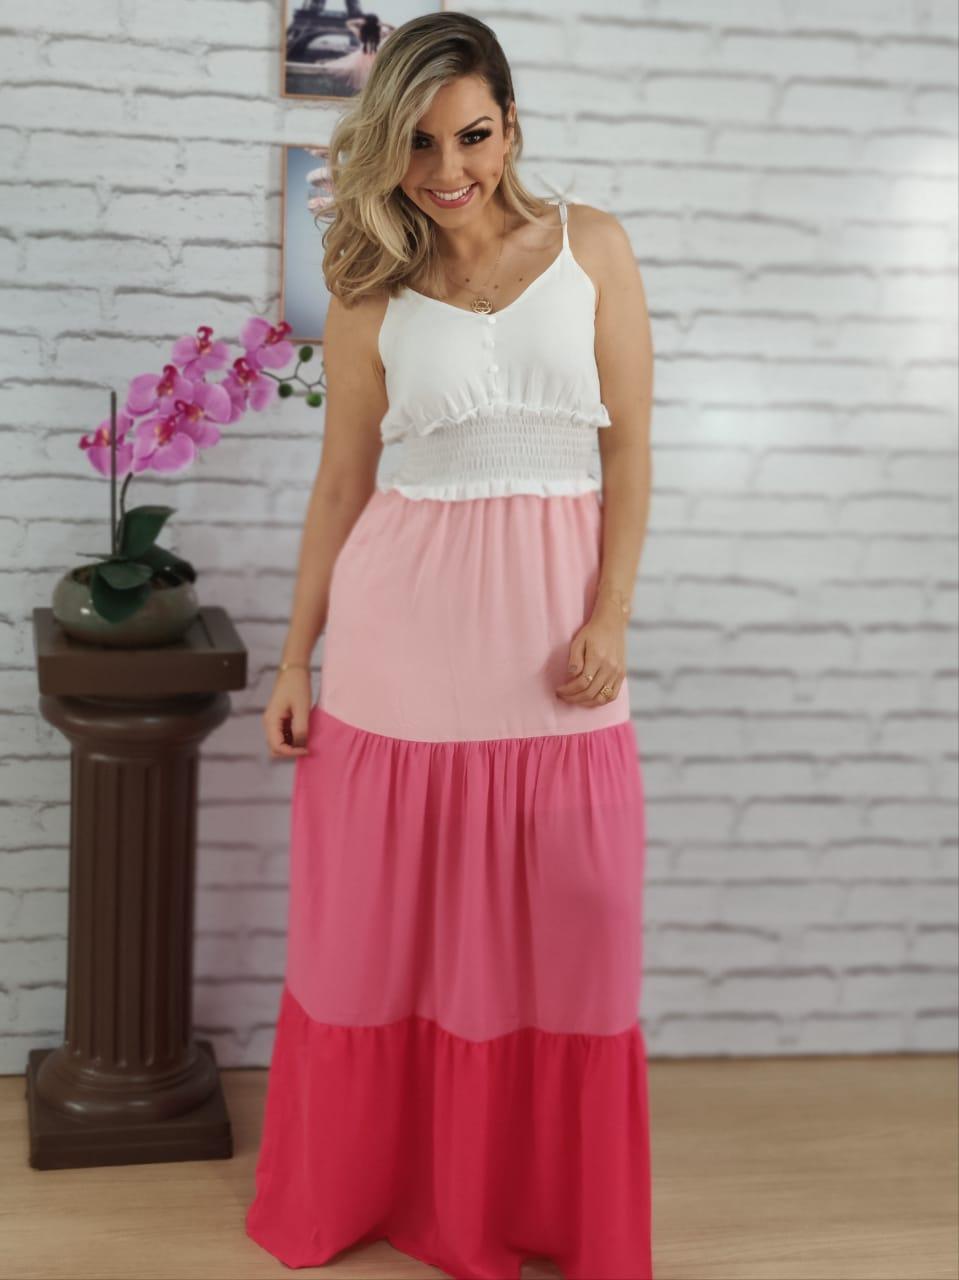 Vestido Longo Laço Alça Tricolor Rosa